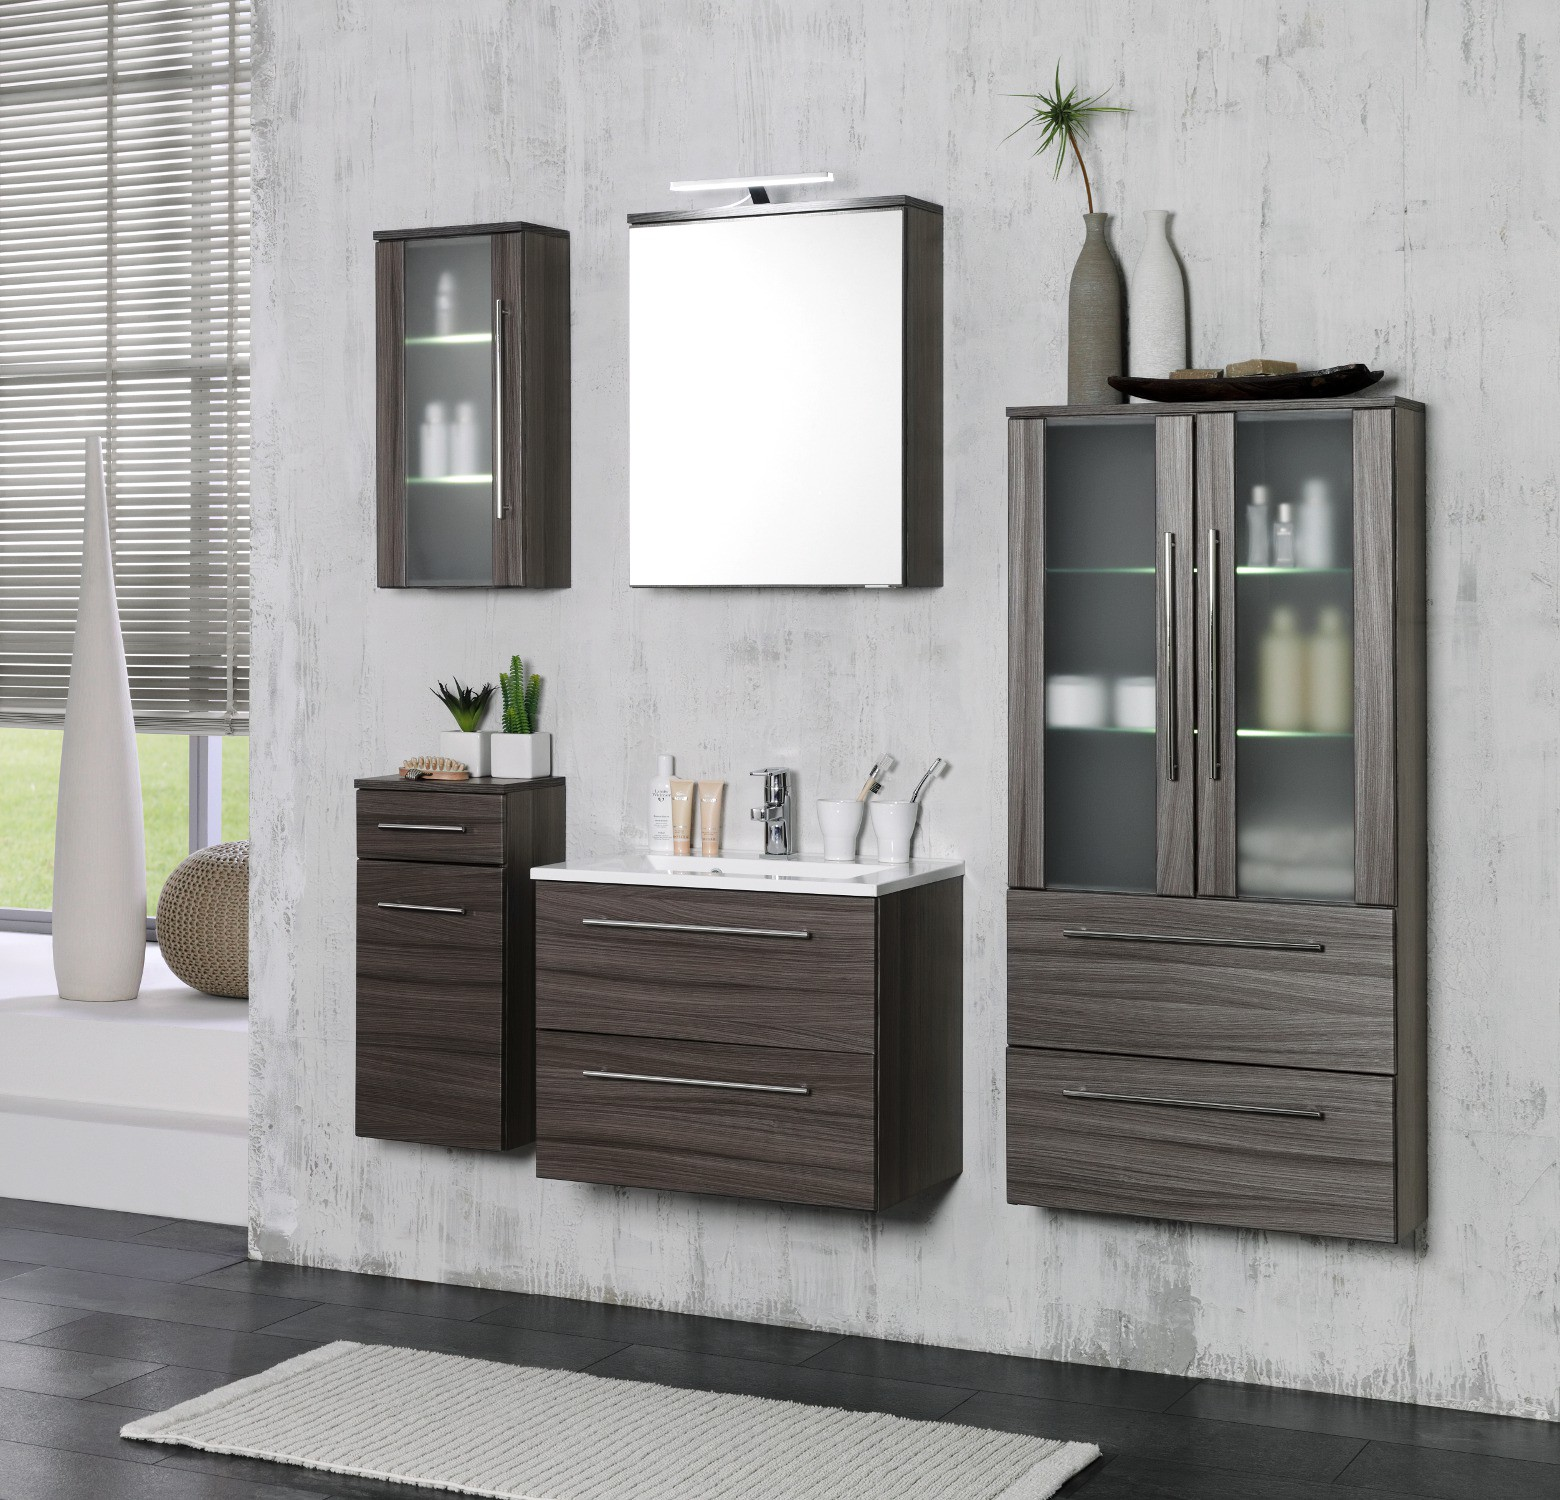 badm bel set eiche dunkel reuniecollegenoetsele. Black Bedroom Furniture Sets. Home Design Ideas